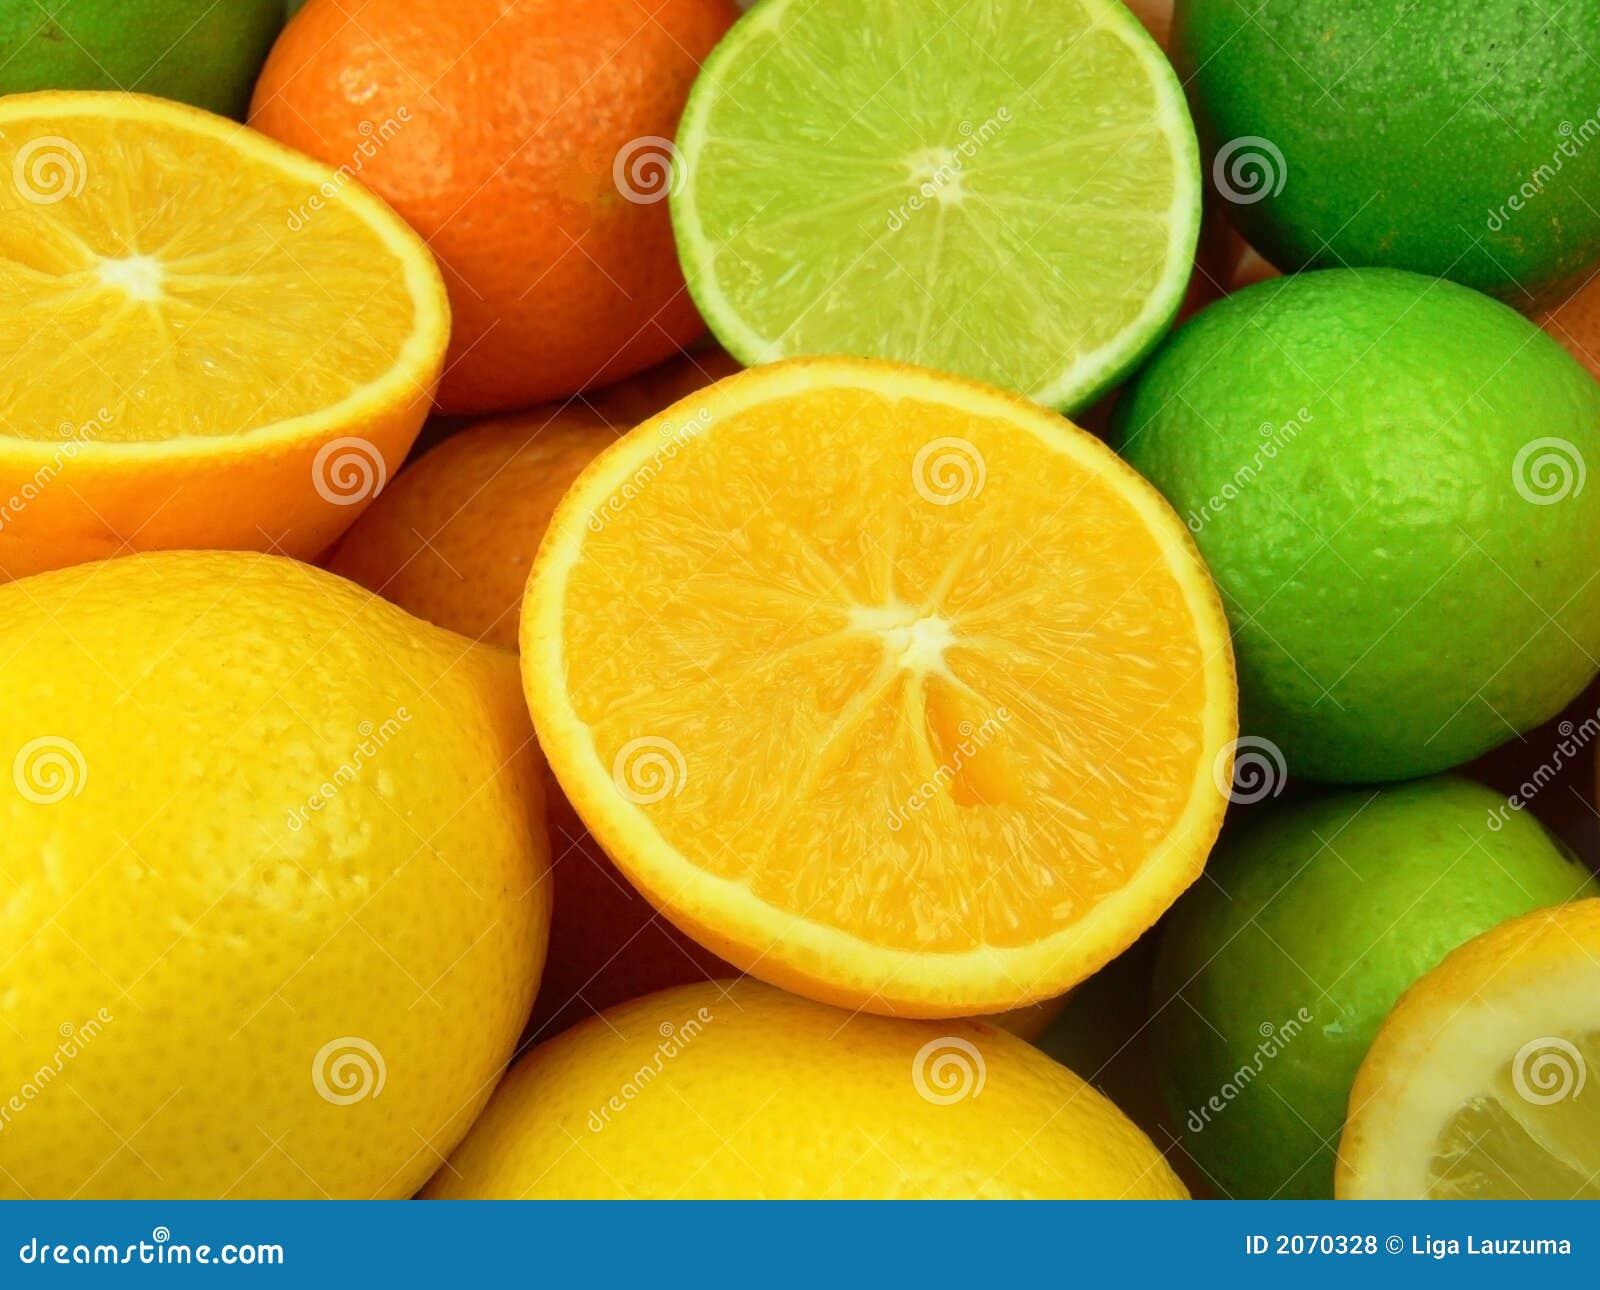 juicy fruits stock photo image of dessert snack background 2070328